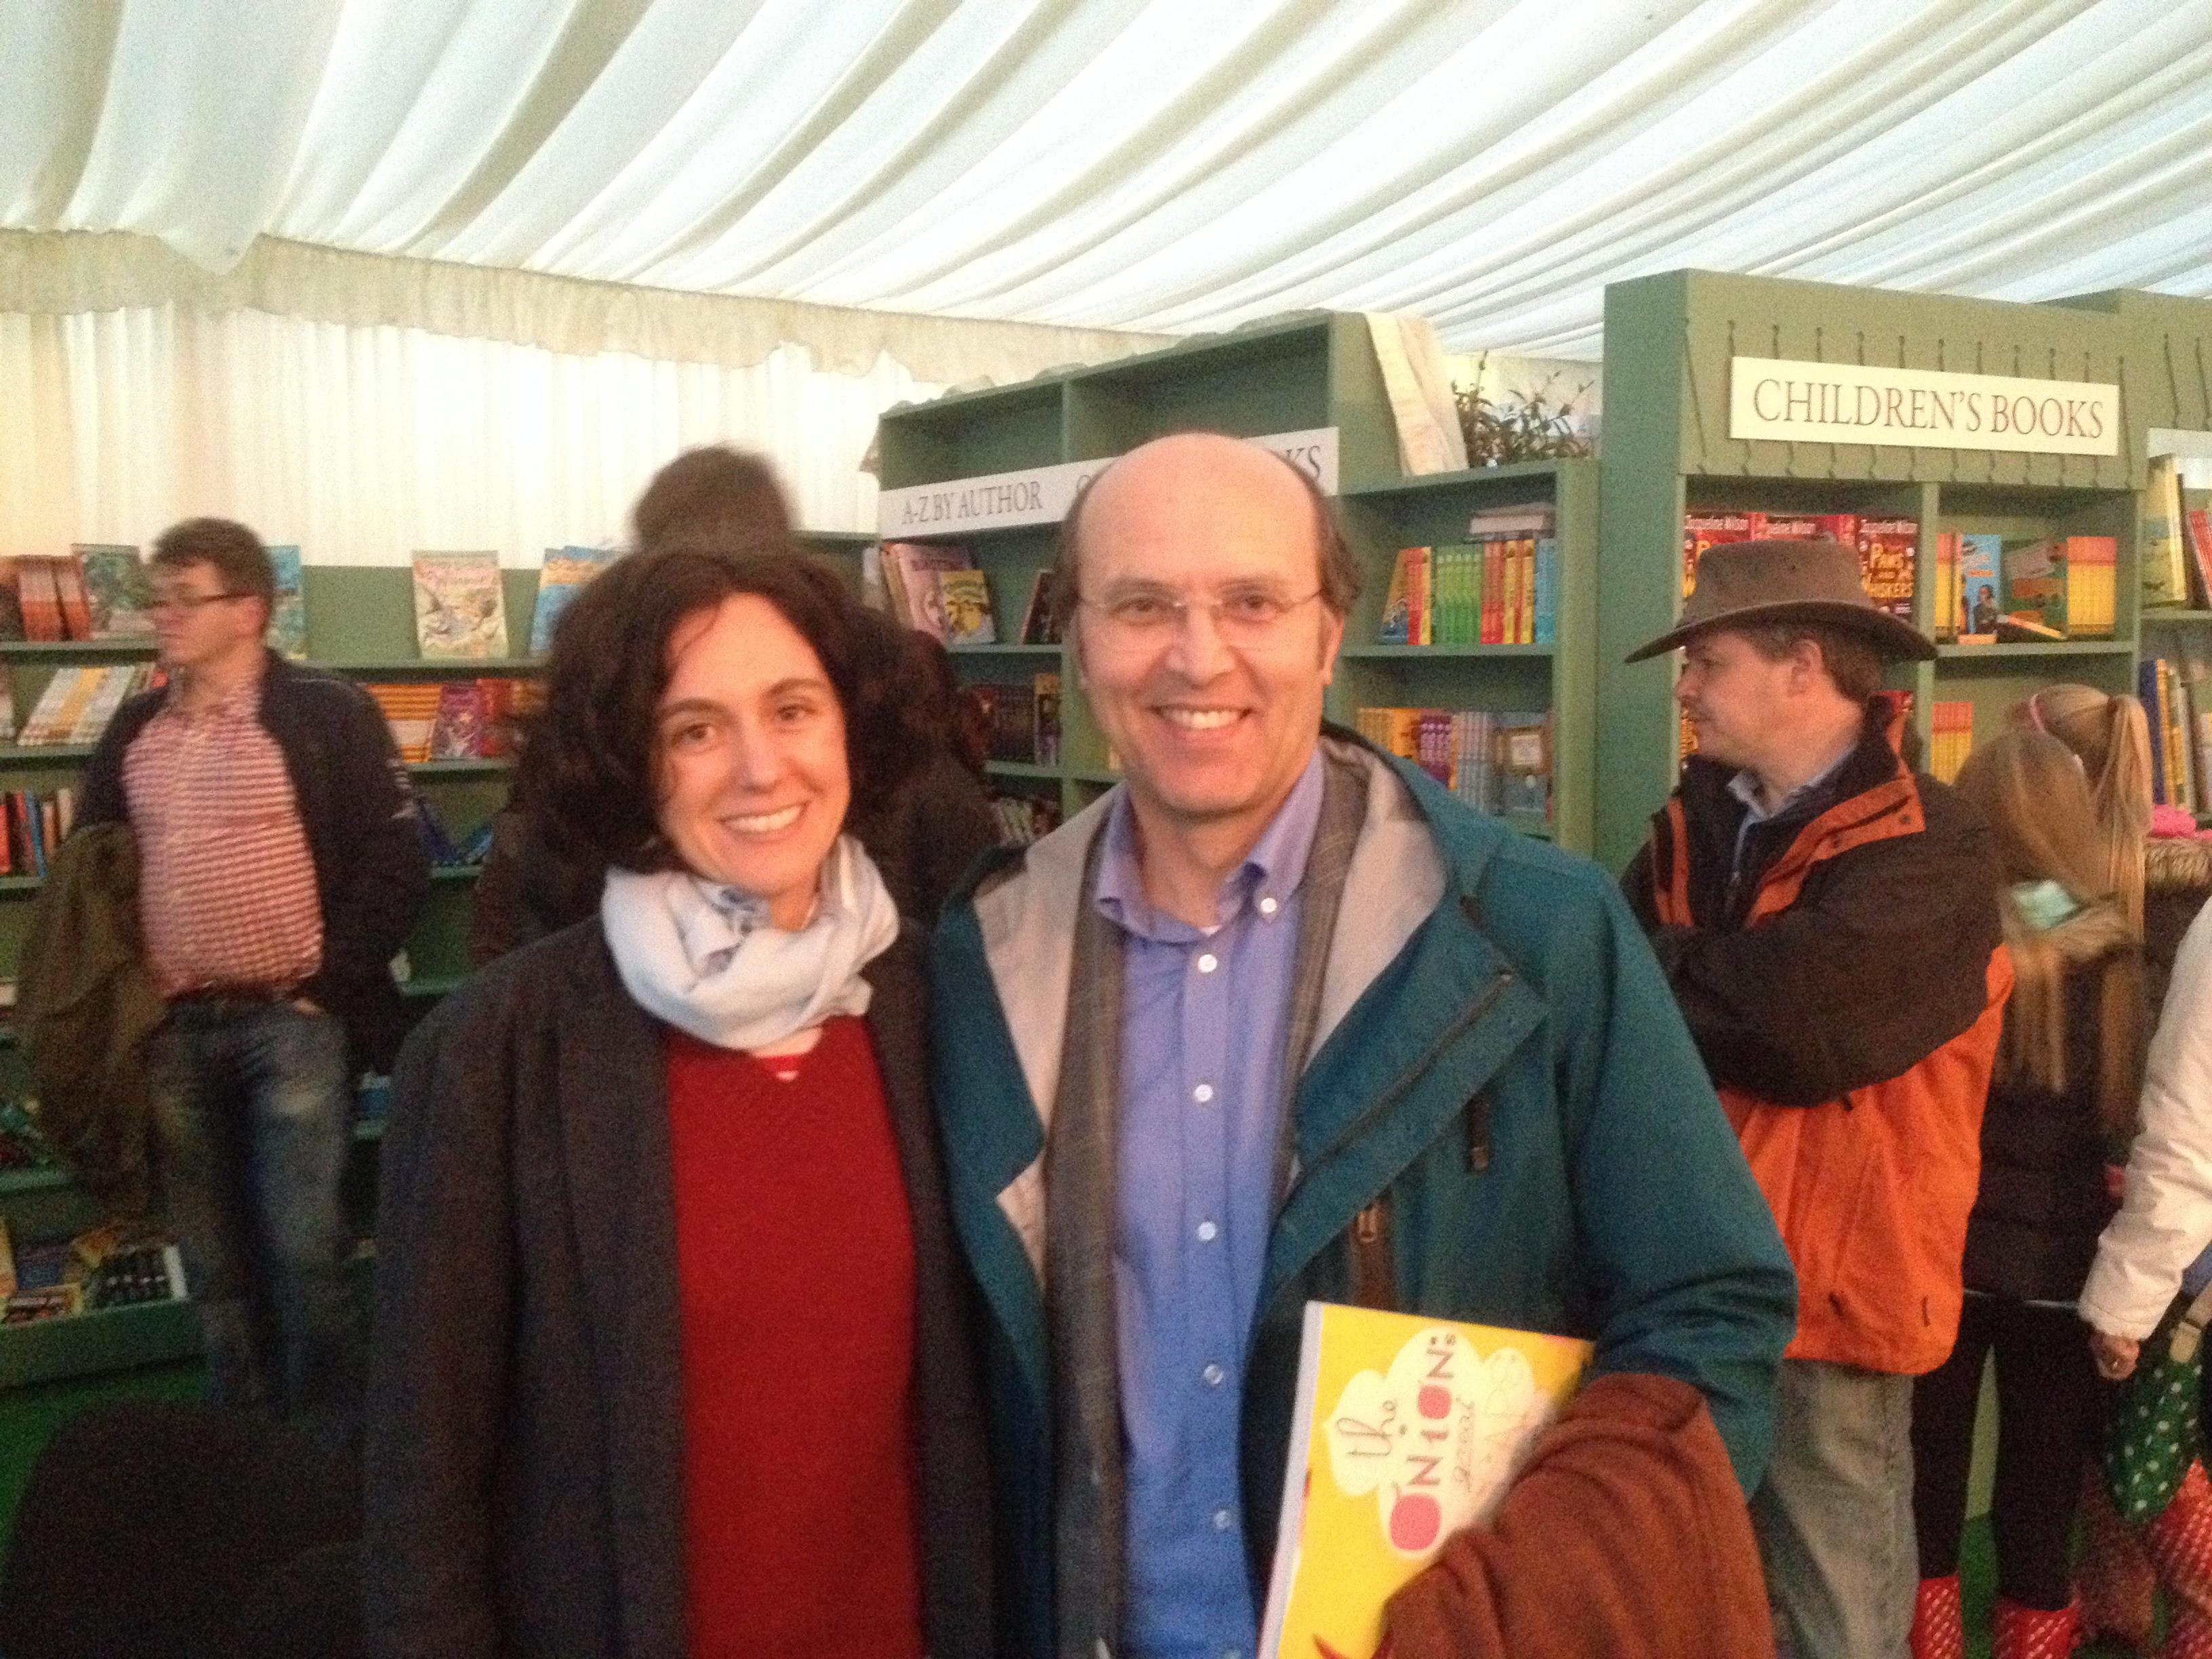 Twenty-four years on: Sara Fanelli and Ceri Thomas, Hay Festival, 2014